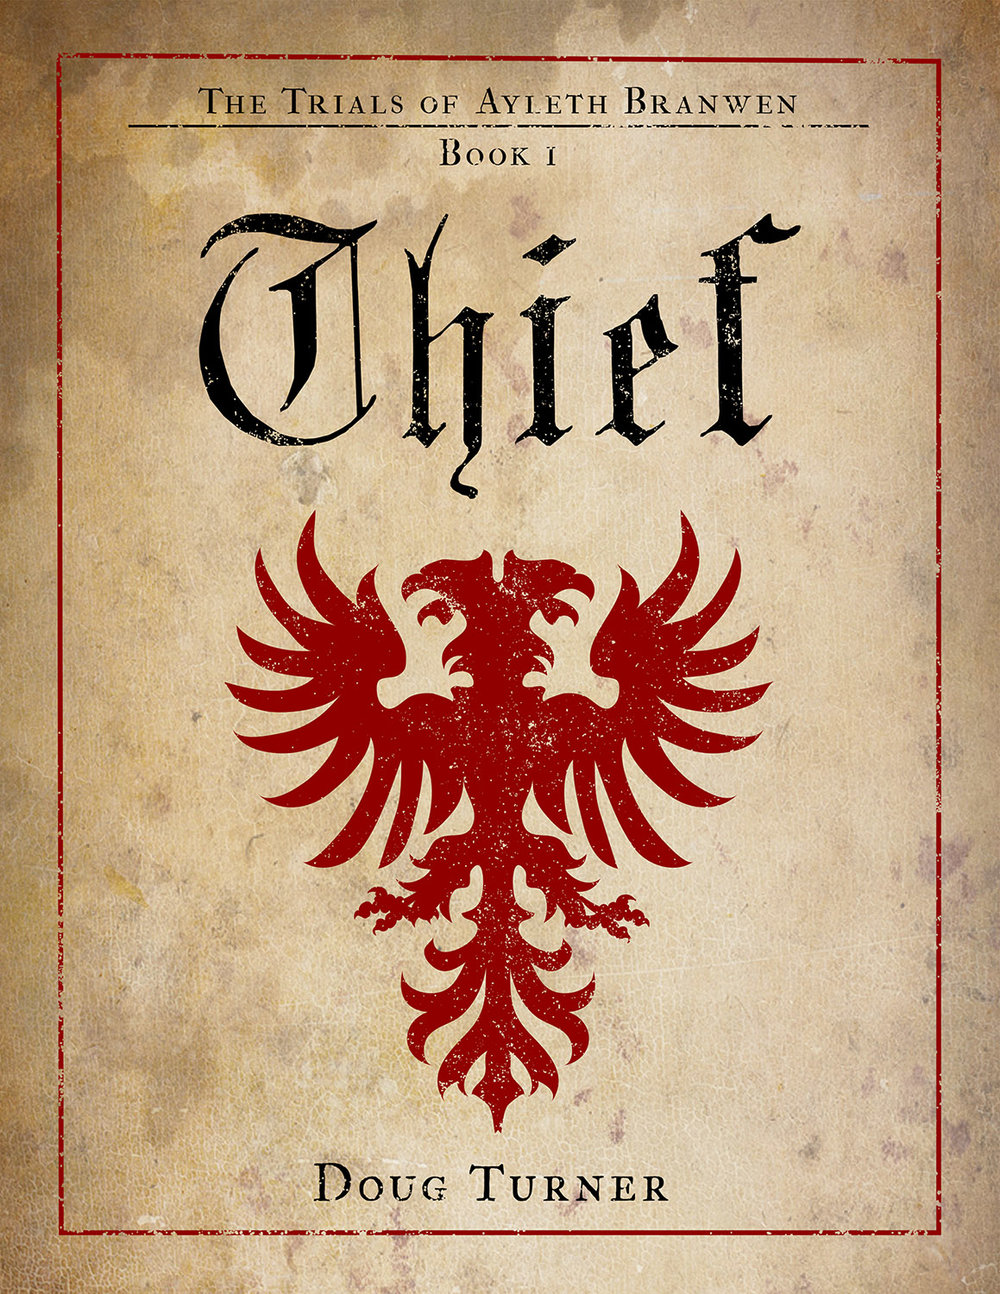 Ayleth-Book-Cover-Progress-w.jpg